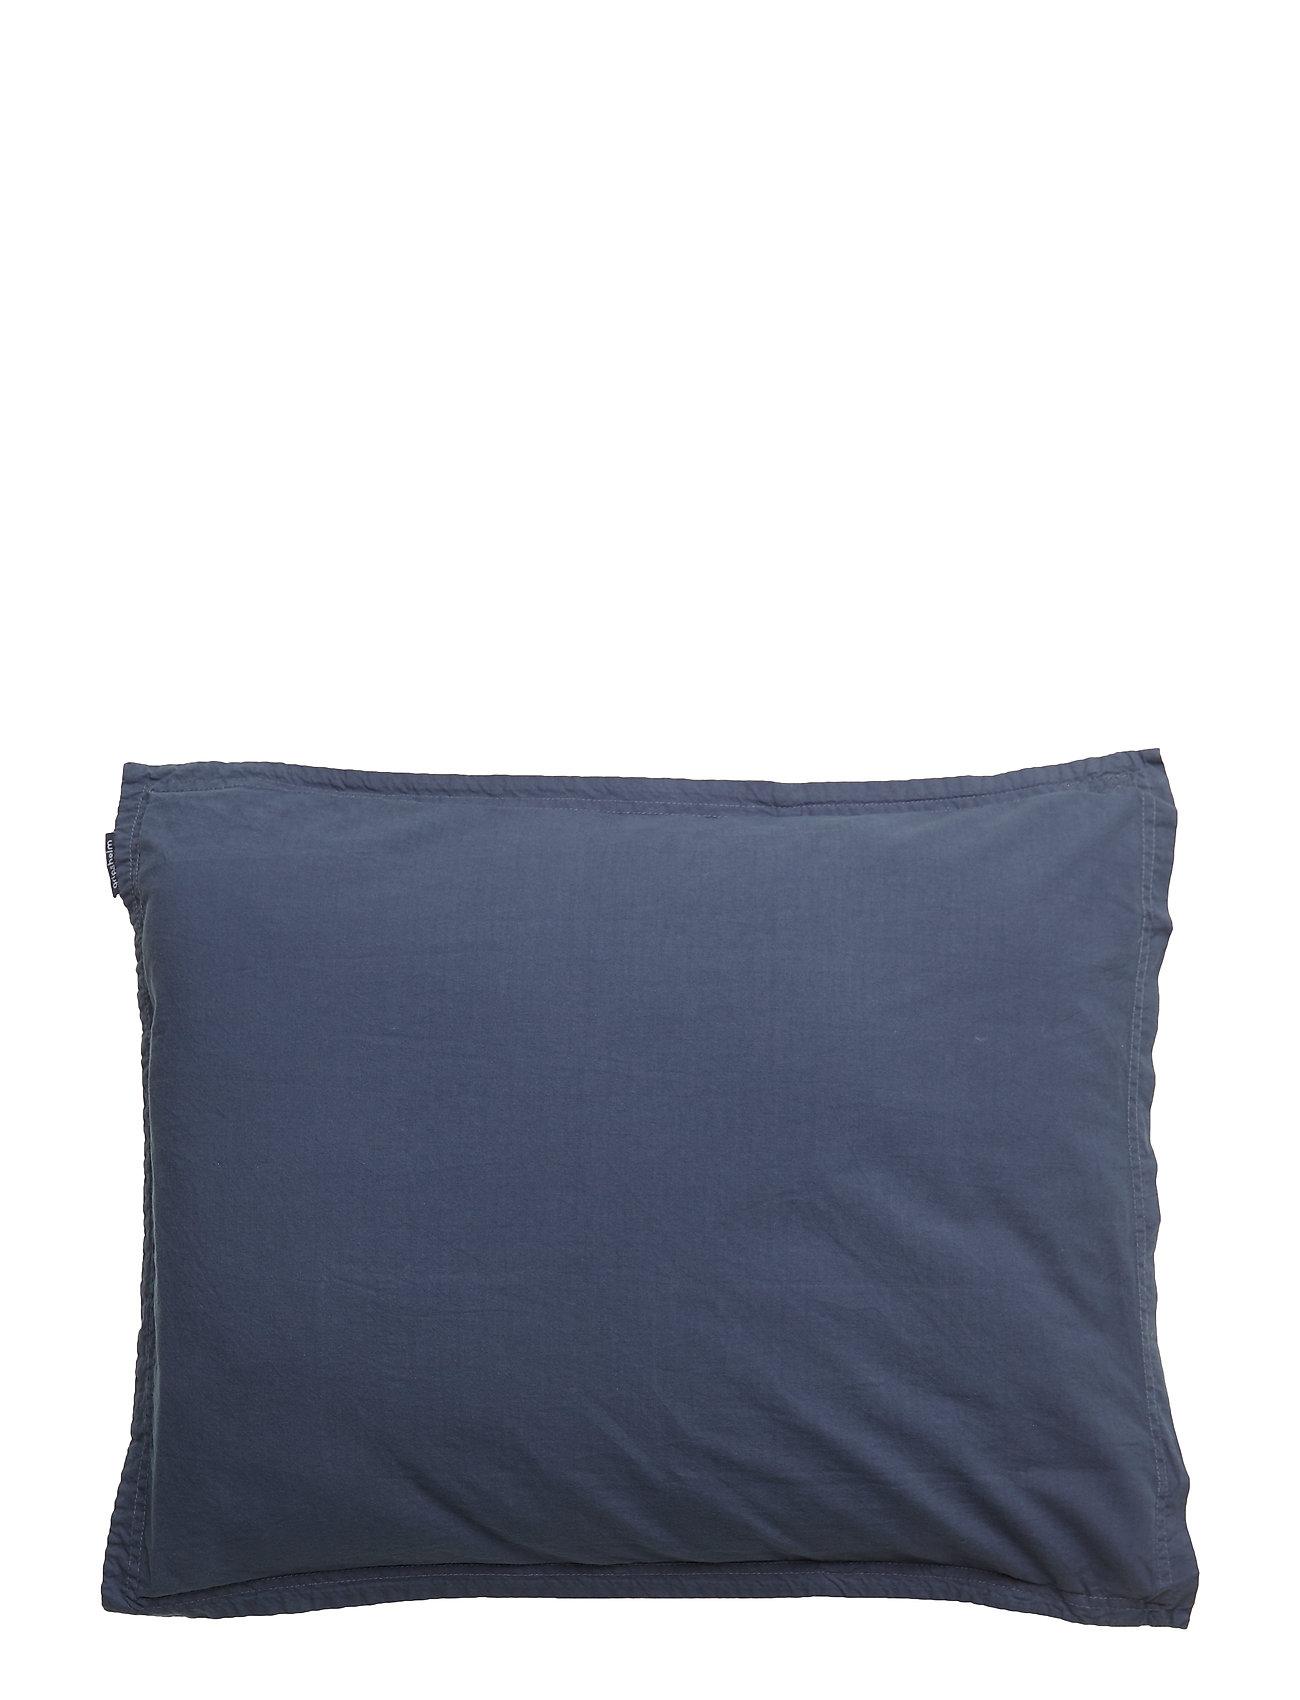 Pillowcase Pillowcase BlueGripsholm Gotsombre Vintage Vintage Gotsombre Vintage BlueGripsholm BlueGripsholm Gotsombre Pillowcase LzGqSUMpV